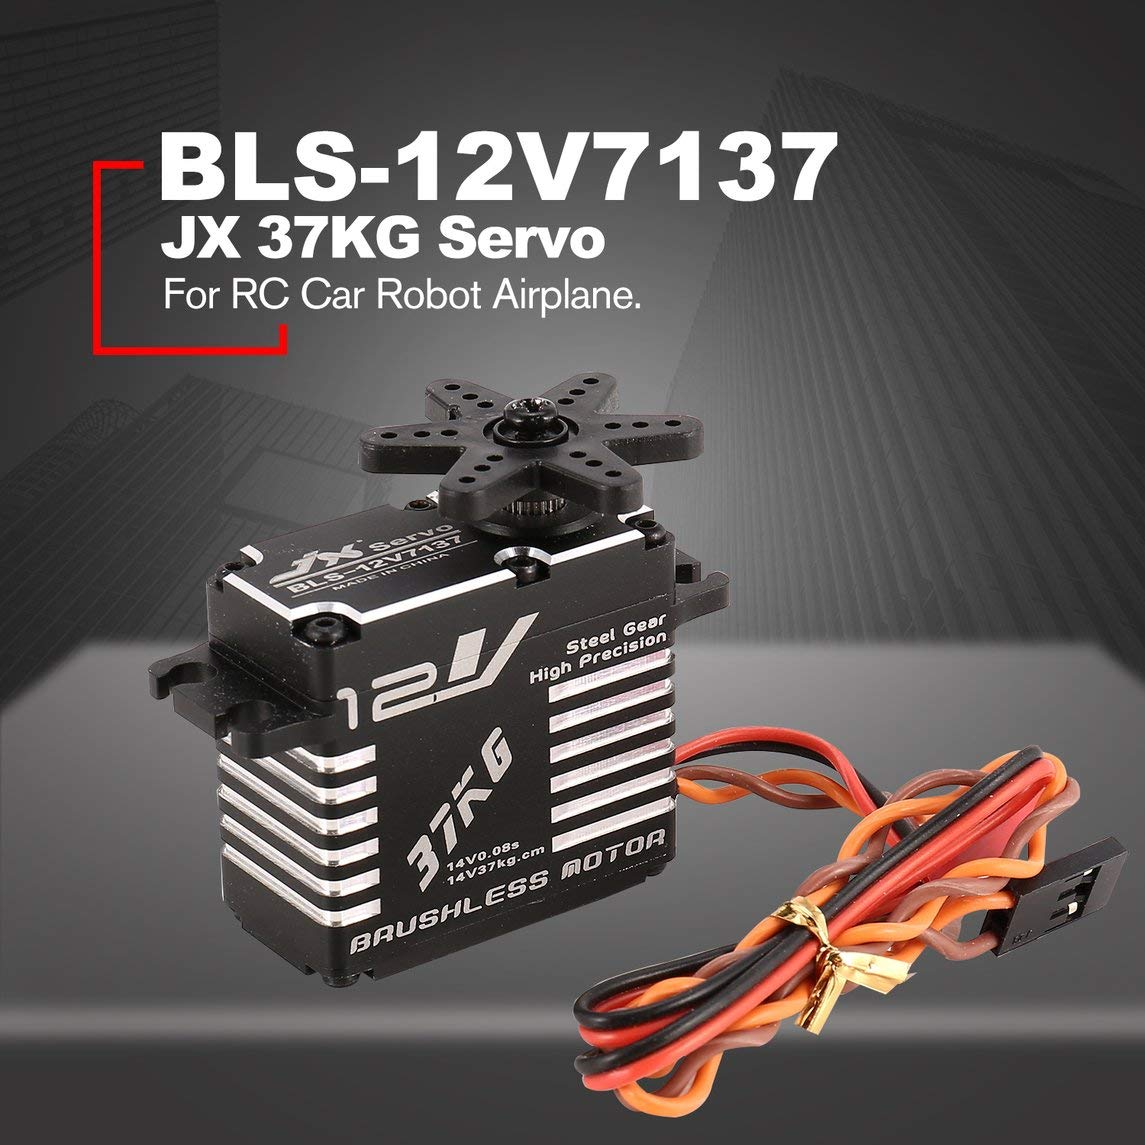 Footprintse JX BLS-12V7137 37KG Metall Lenkung Digital 12V HV Brushless Servo für RC Car-Farbe: Schwarz